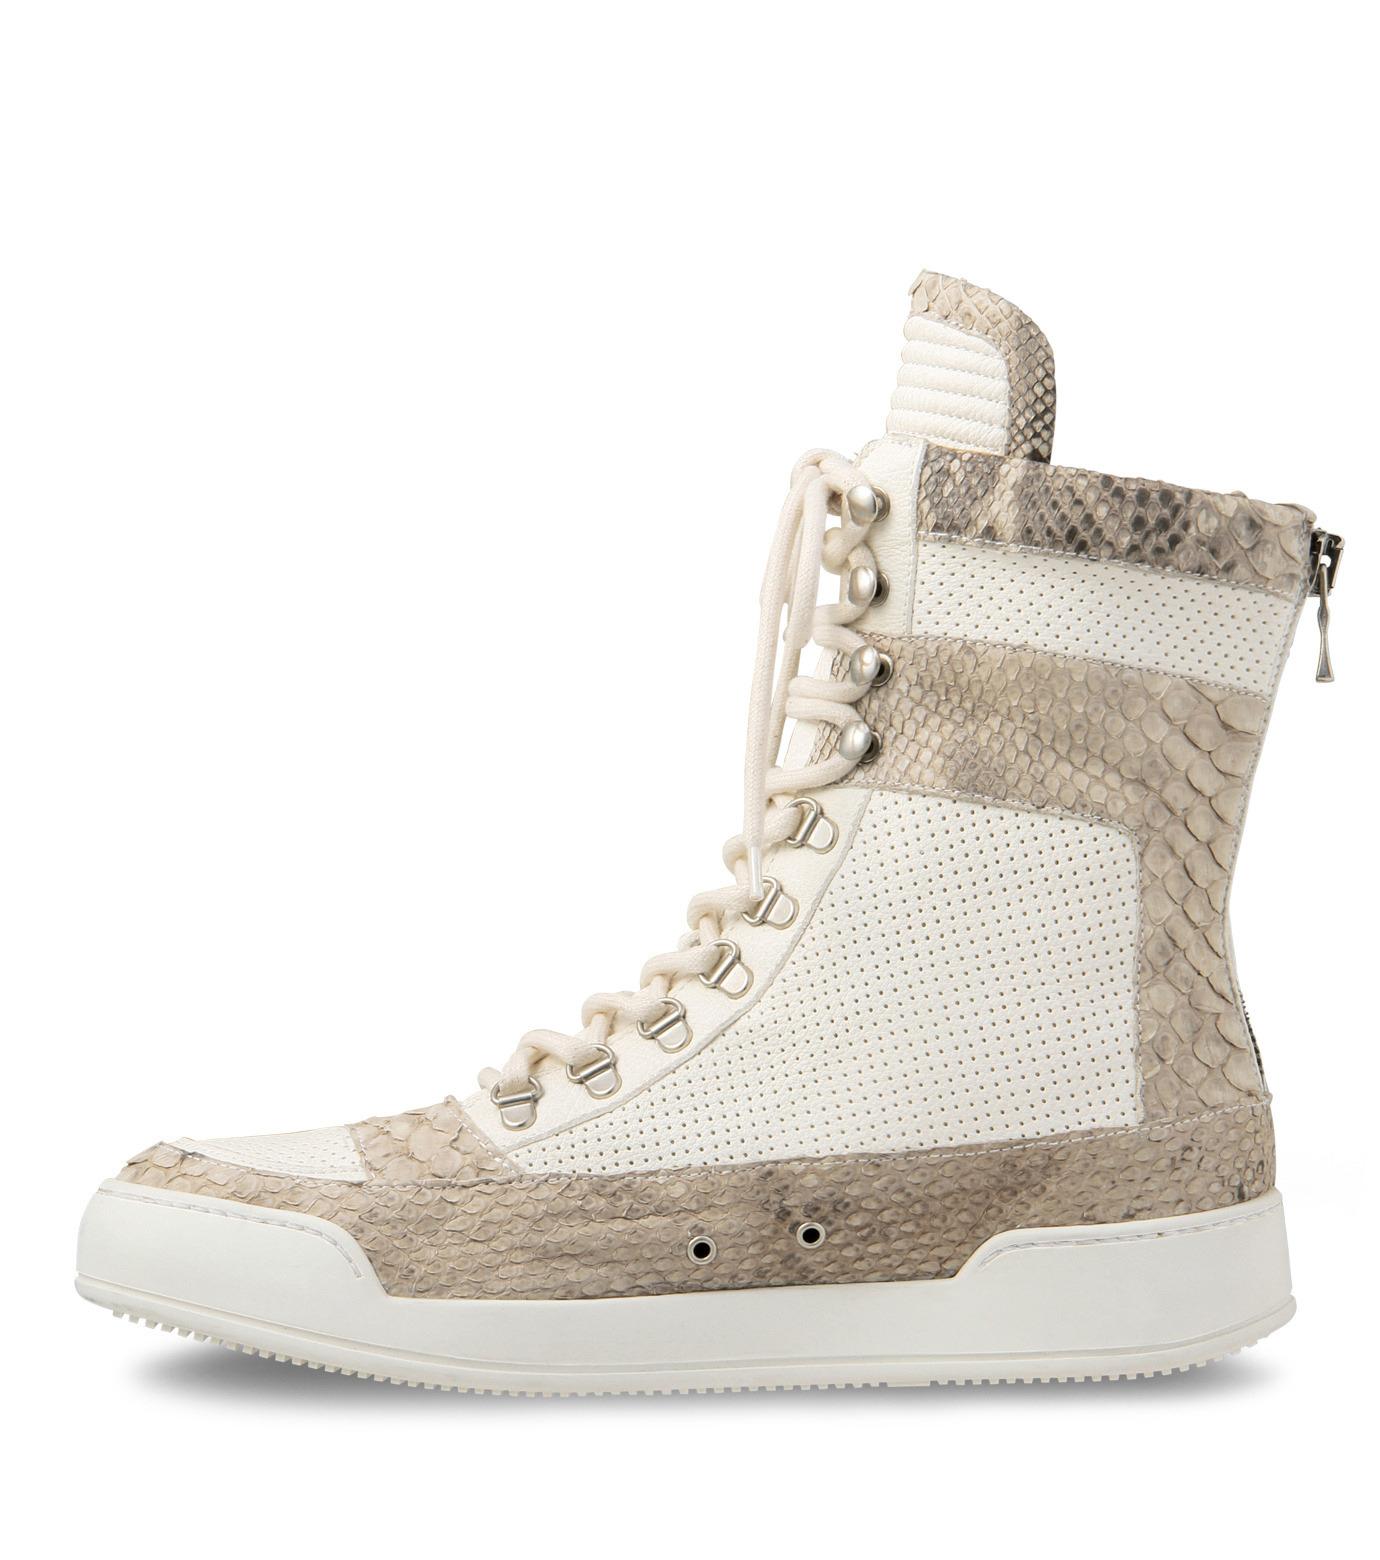 Balmain(バルマン)のHi cut sneaker-WHITE-T306-C189-4 拡大詳細画像2